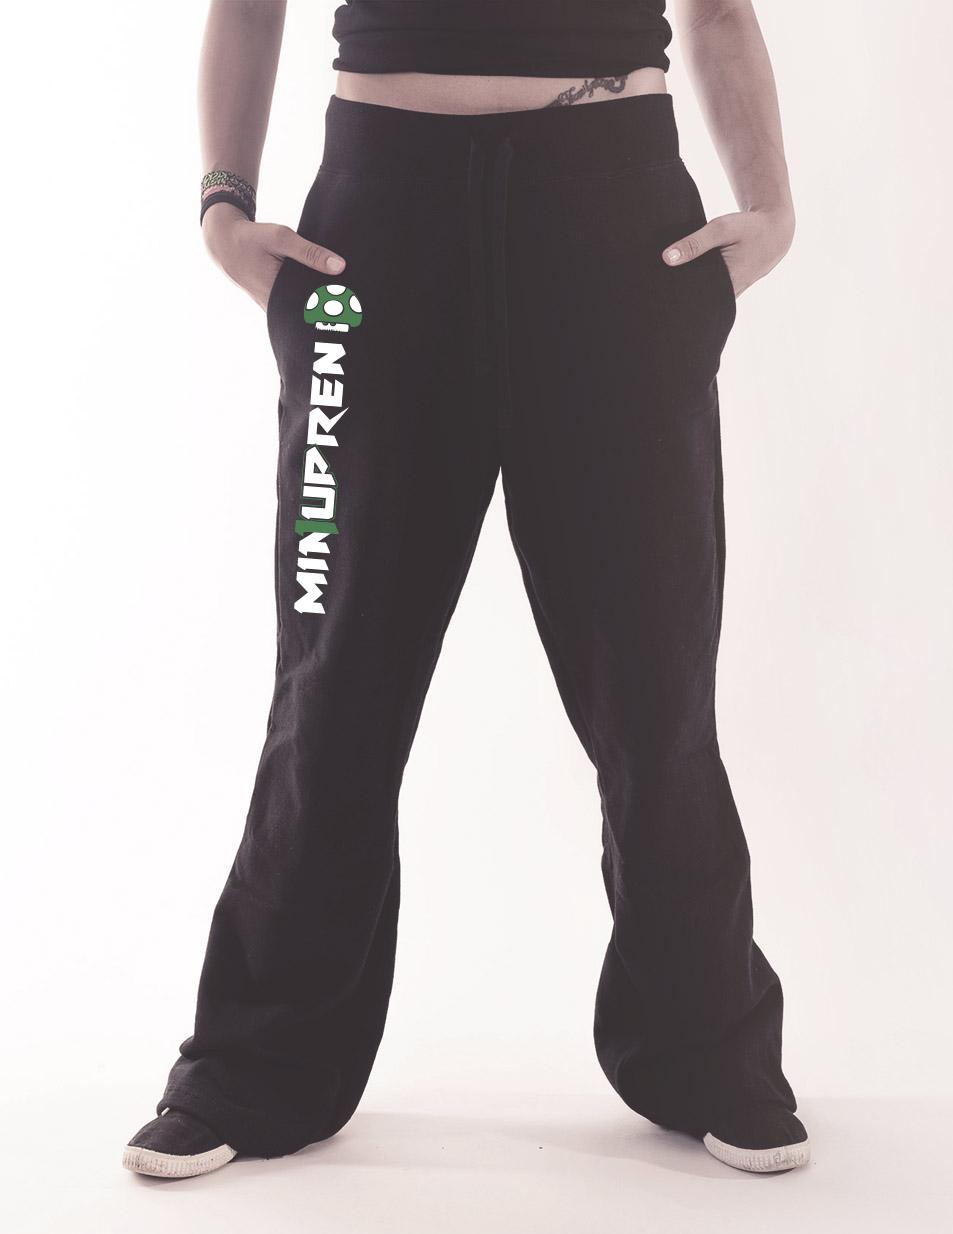 Damen-Jogginghose min1upren mehrfarbig auf schwarz